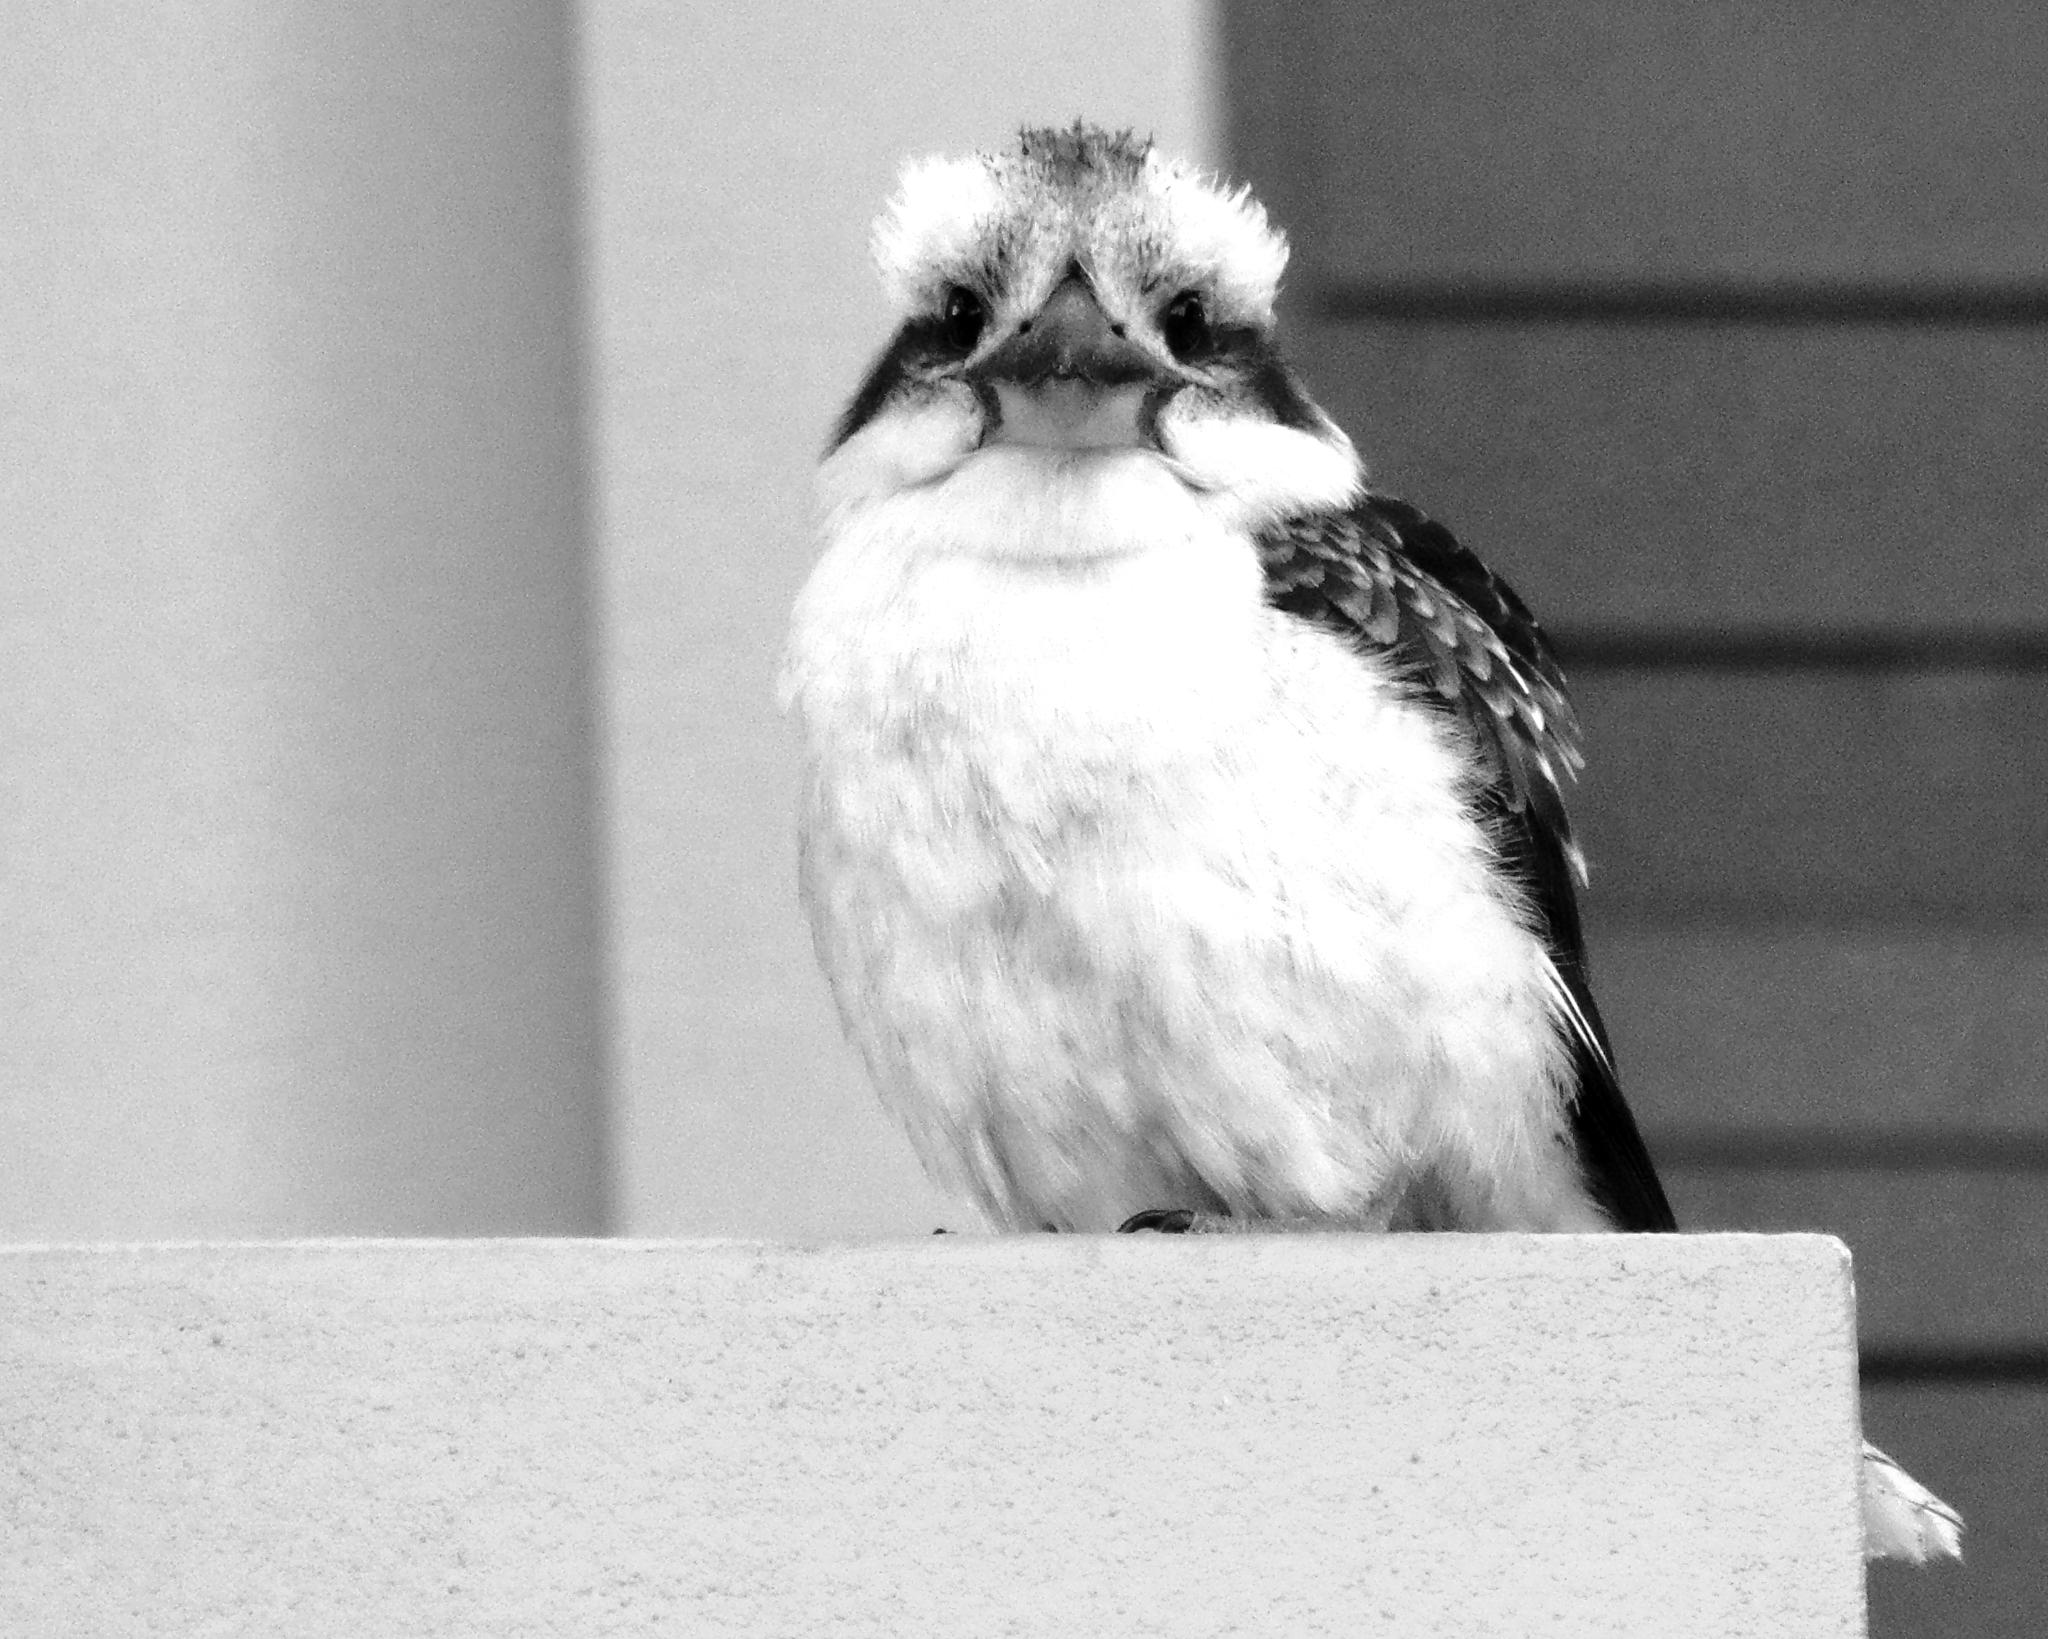 Kookaburra sees me by cinzia.sawatzky